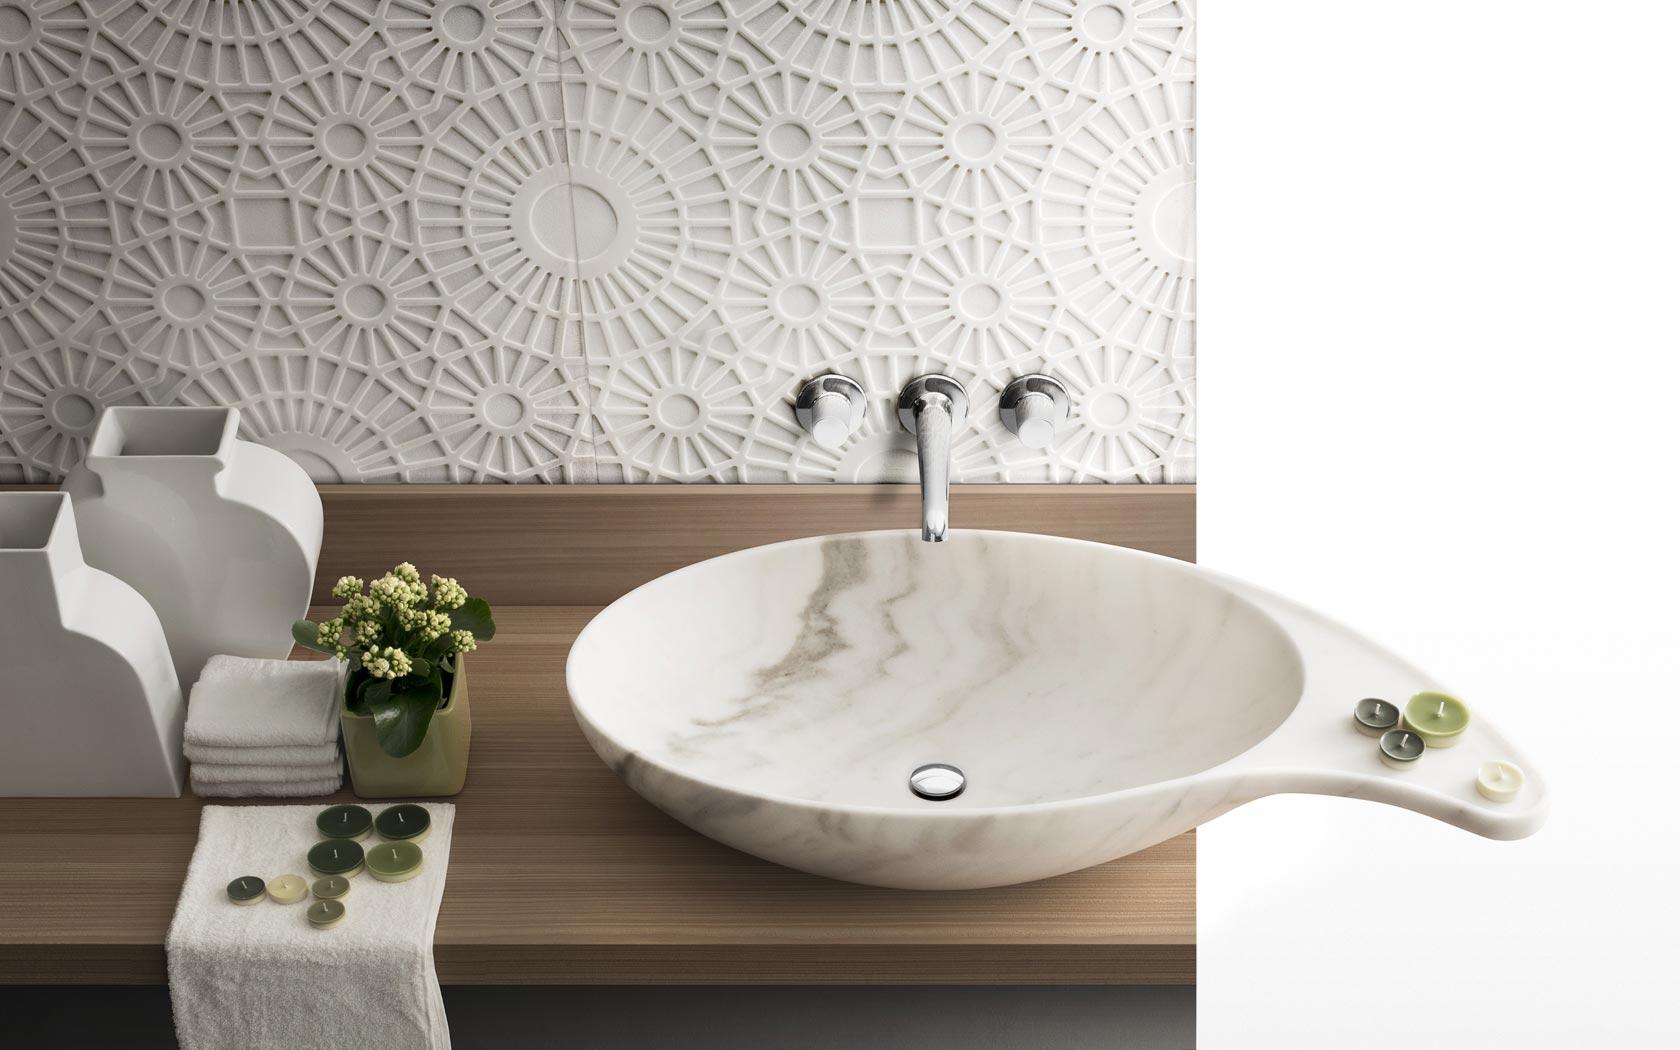 Charmant Toilets / Sinks U0026 More